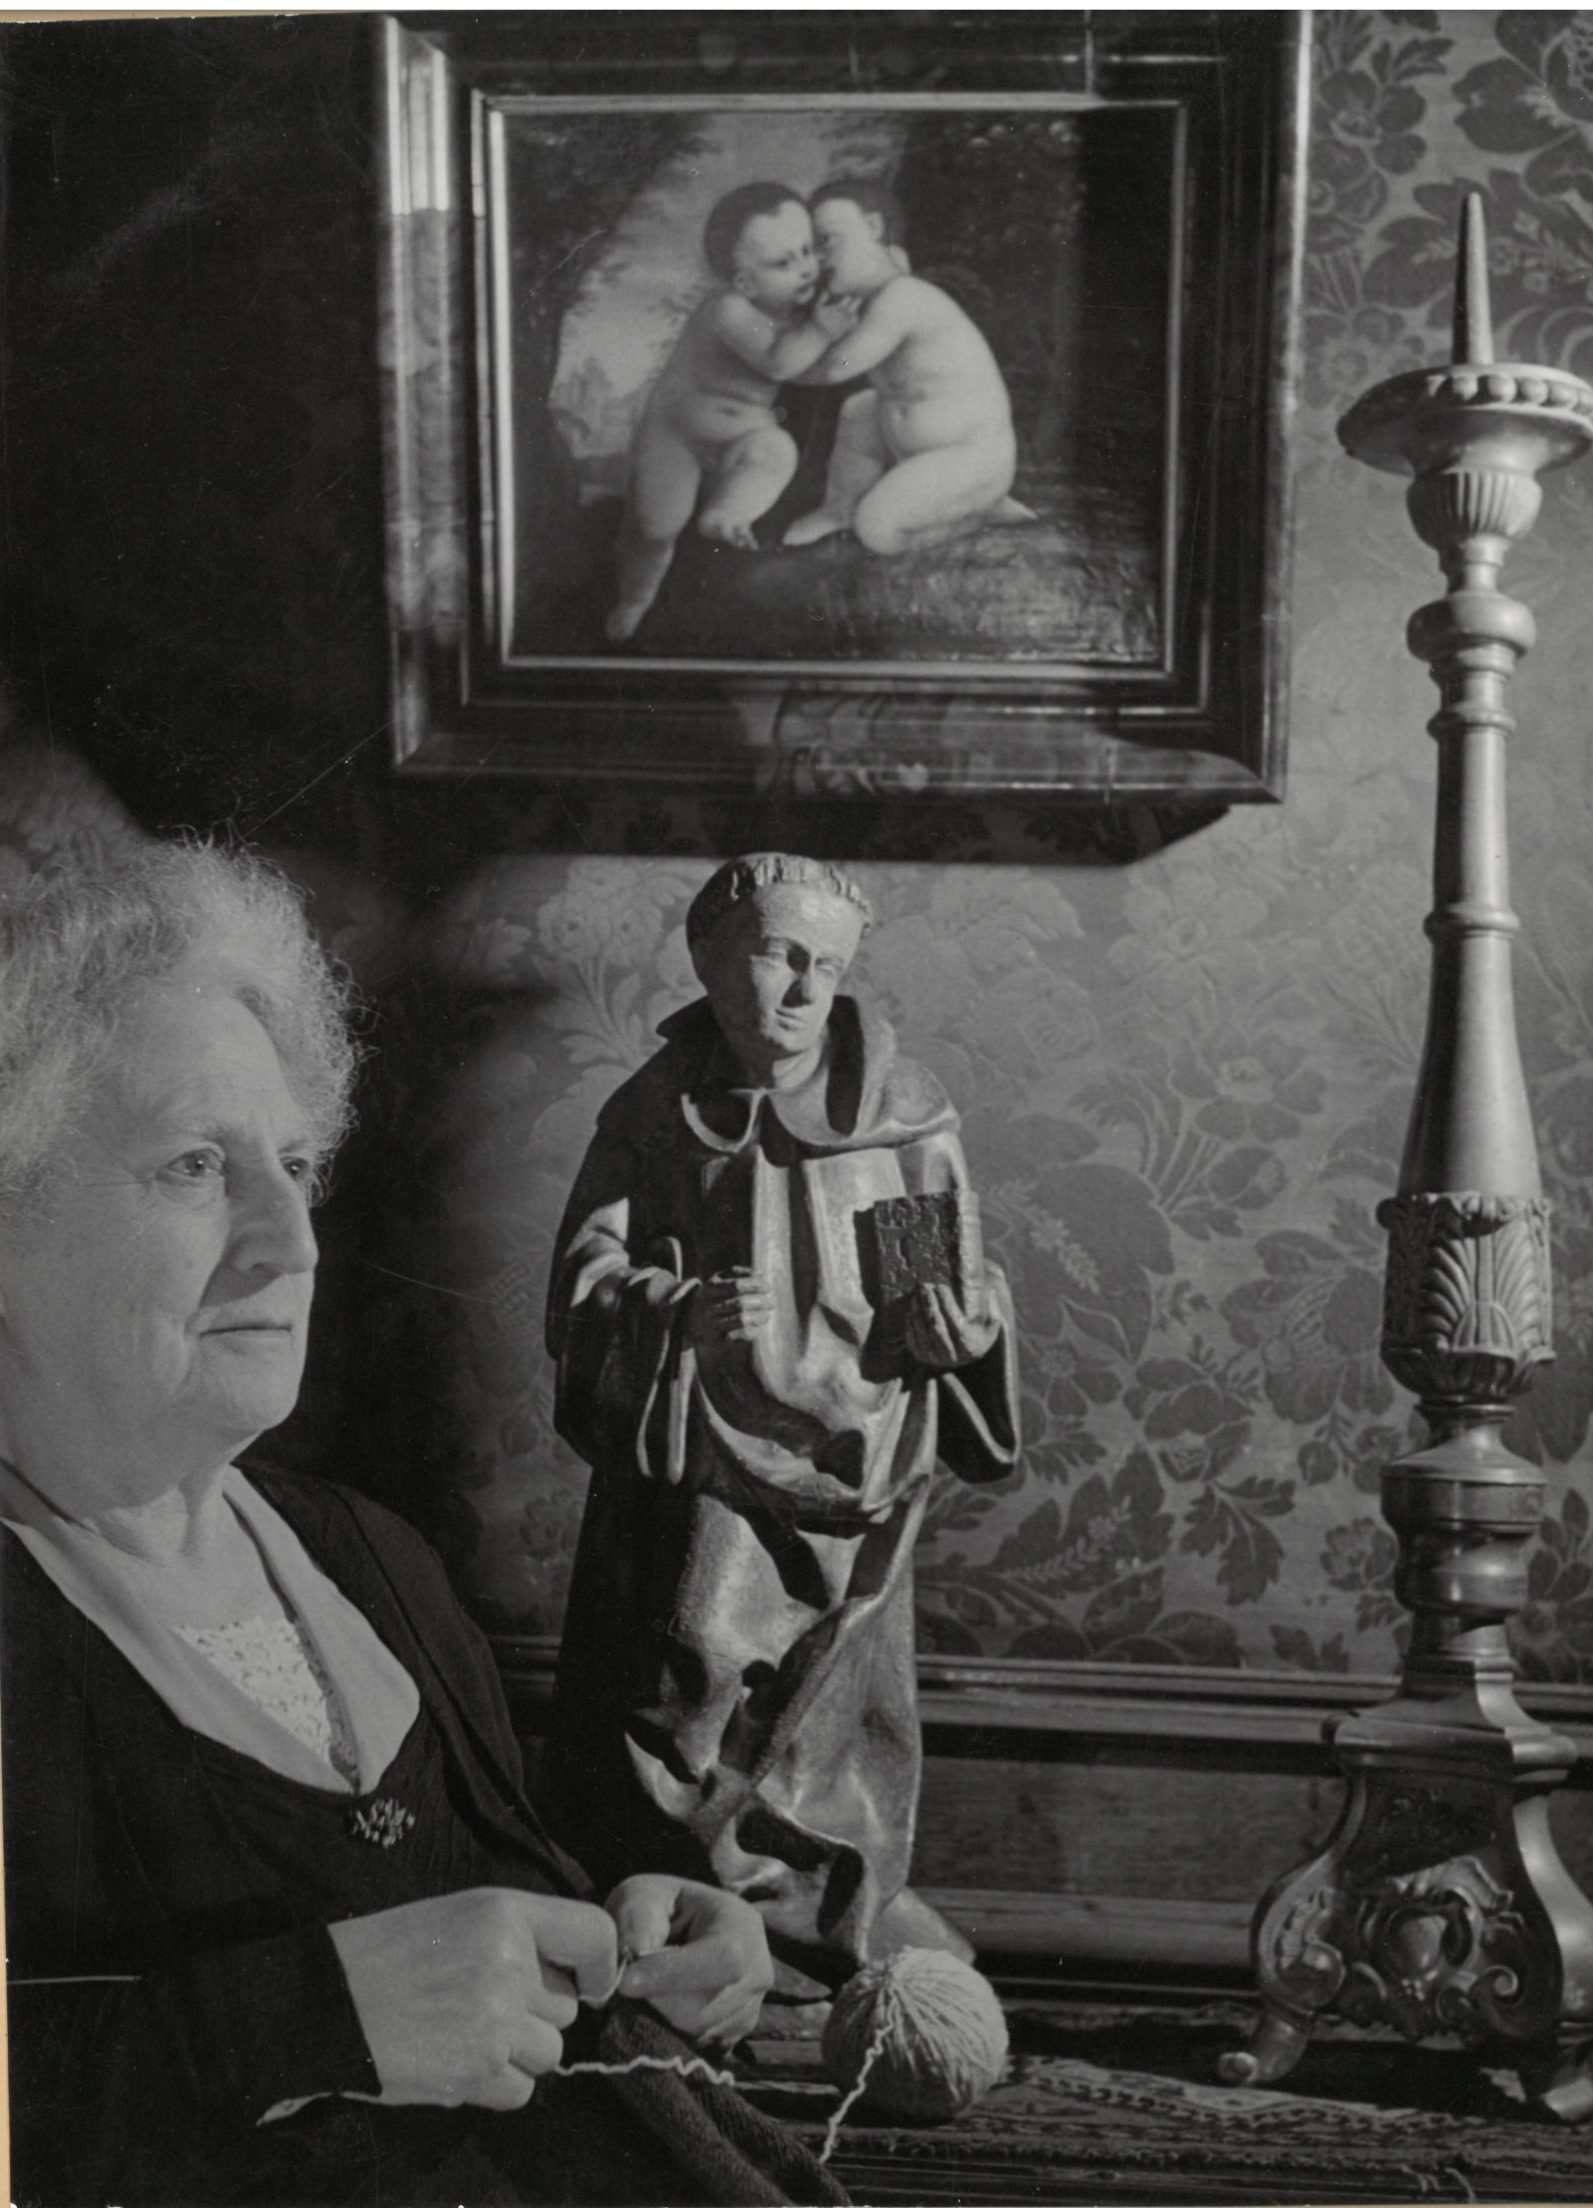 Jans Denijs, 1950. Foto Cas Oorthuys, particuliere collectie.